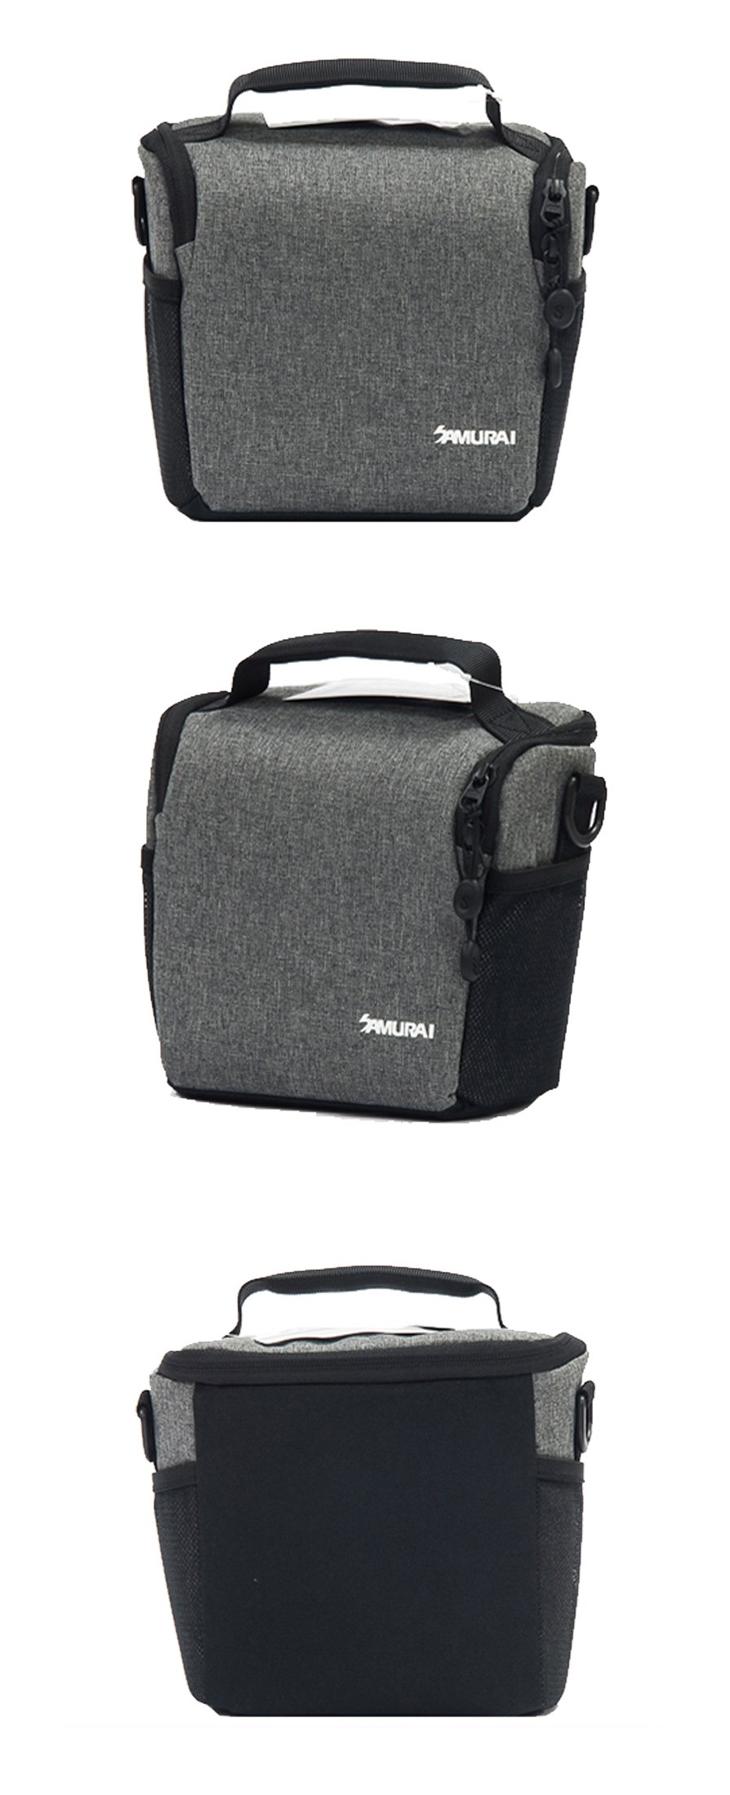 【EC數位】SAMURAI 新武士 S-CAM 02M 輕便旅遊手提相機包 一機二鏡 相機包 攝影收納袋 便攜包 攝影包